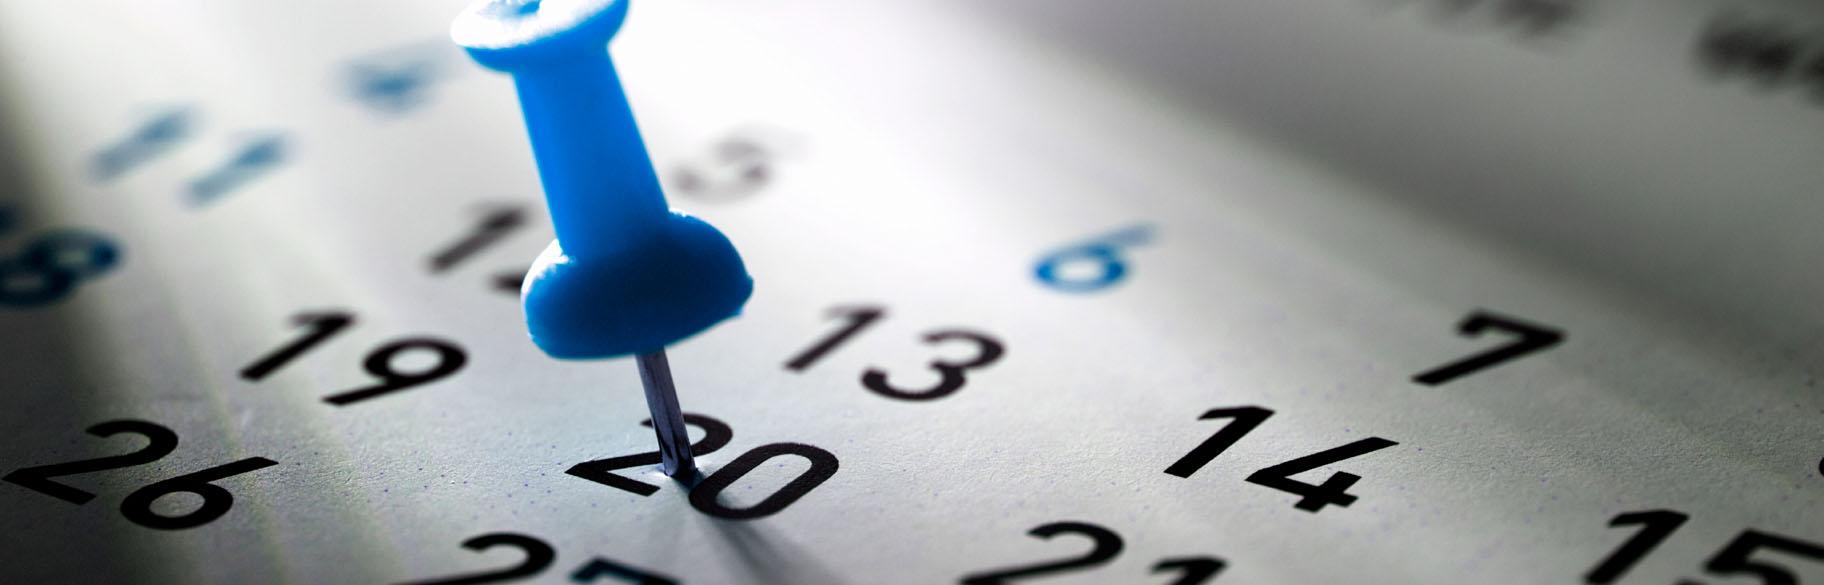 Schedule Service 1